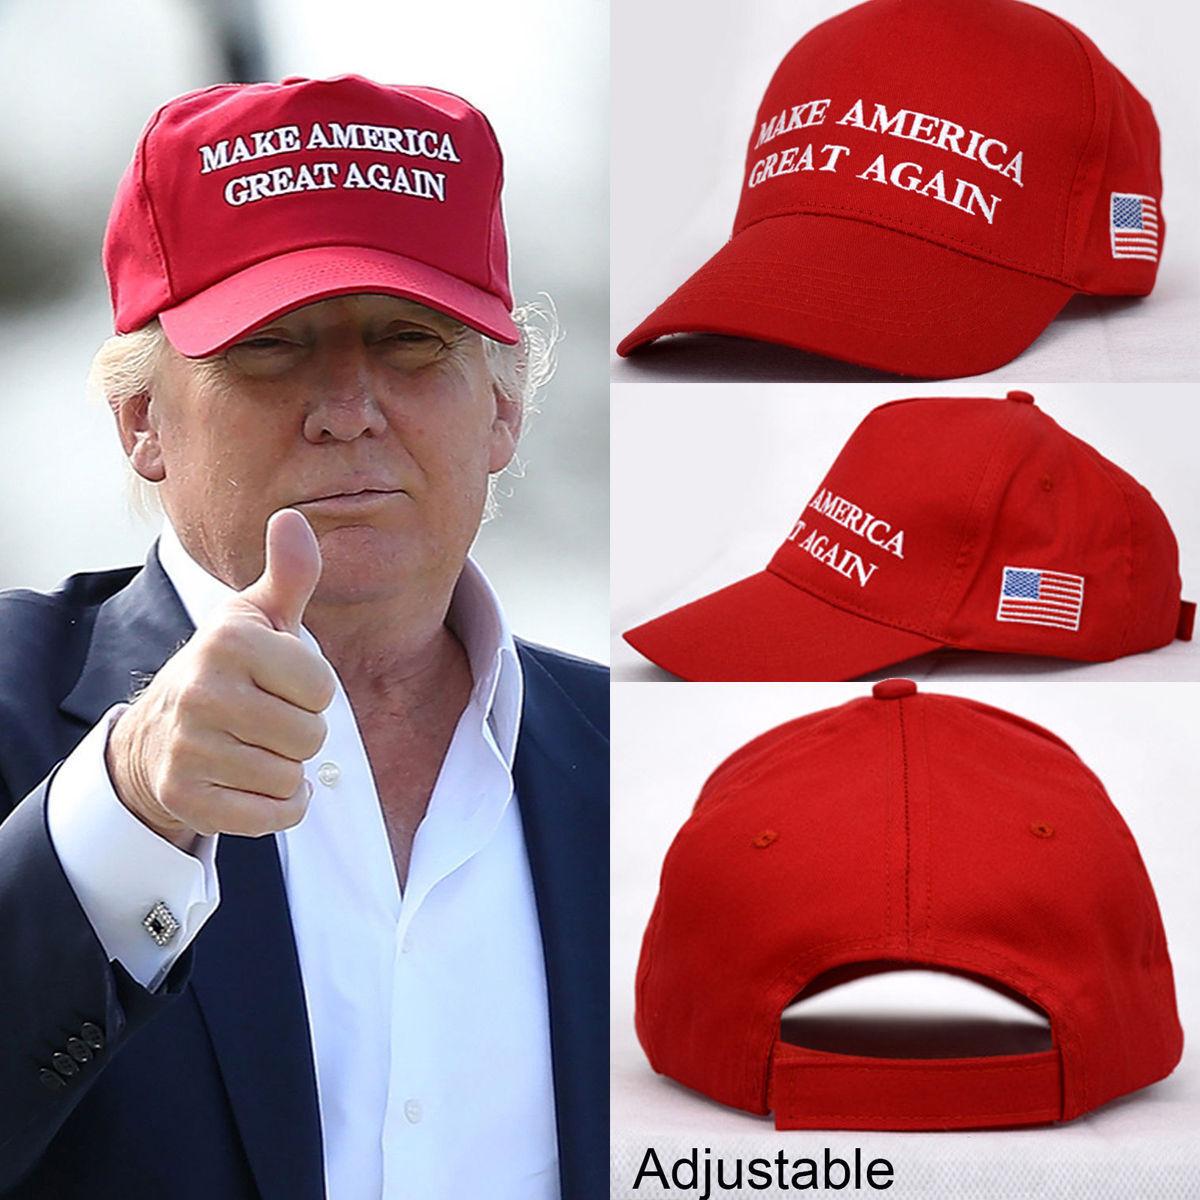 5569985daddfe Details about Men Make America Great Again Hat Donald Trump Republican Adjustable  Baseball Cap